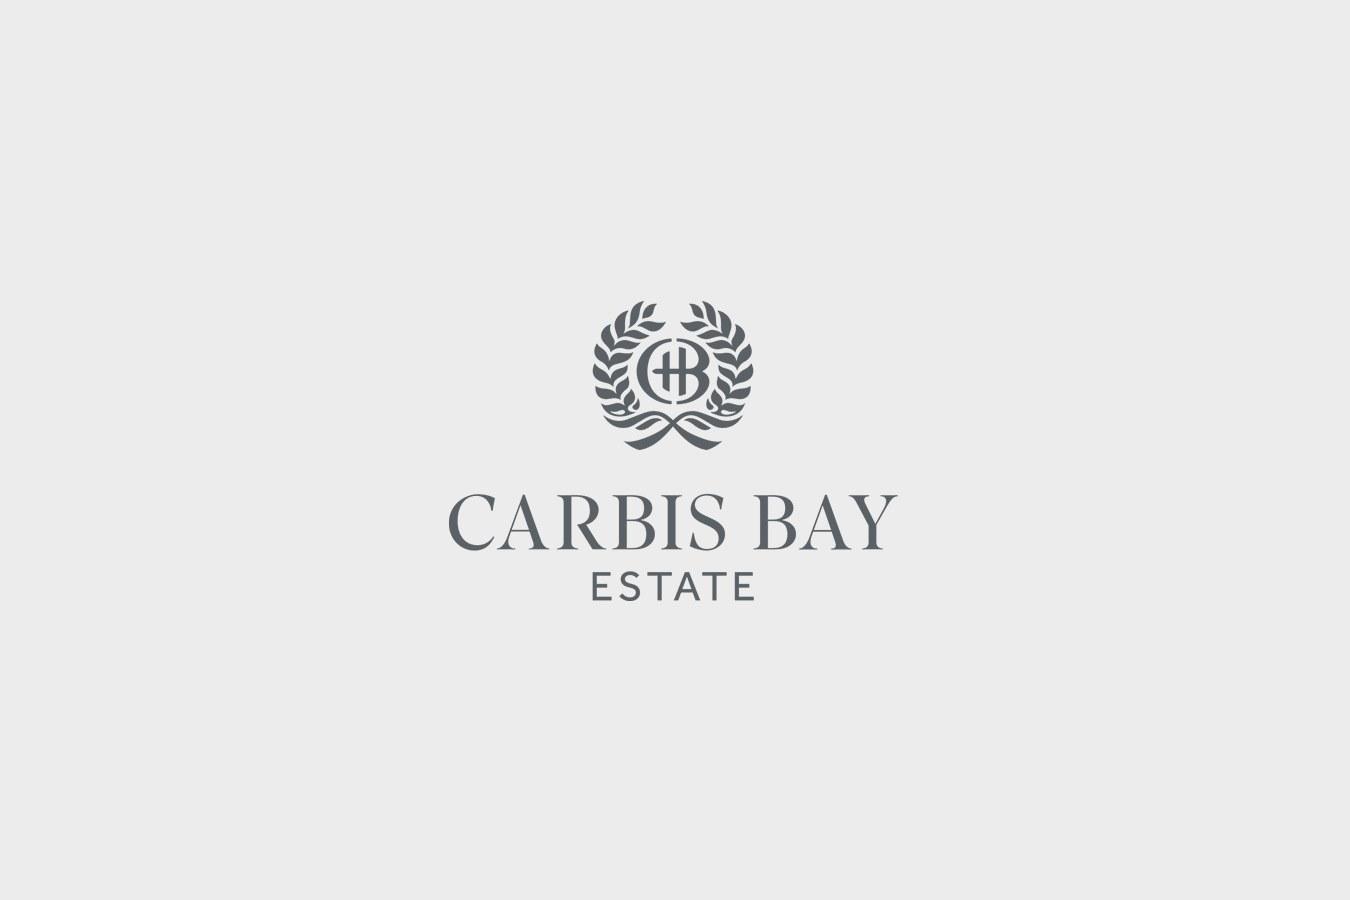 Carbis Bay Hotel & Estate - Luxury hotels Cornwall